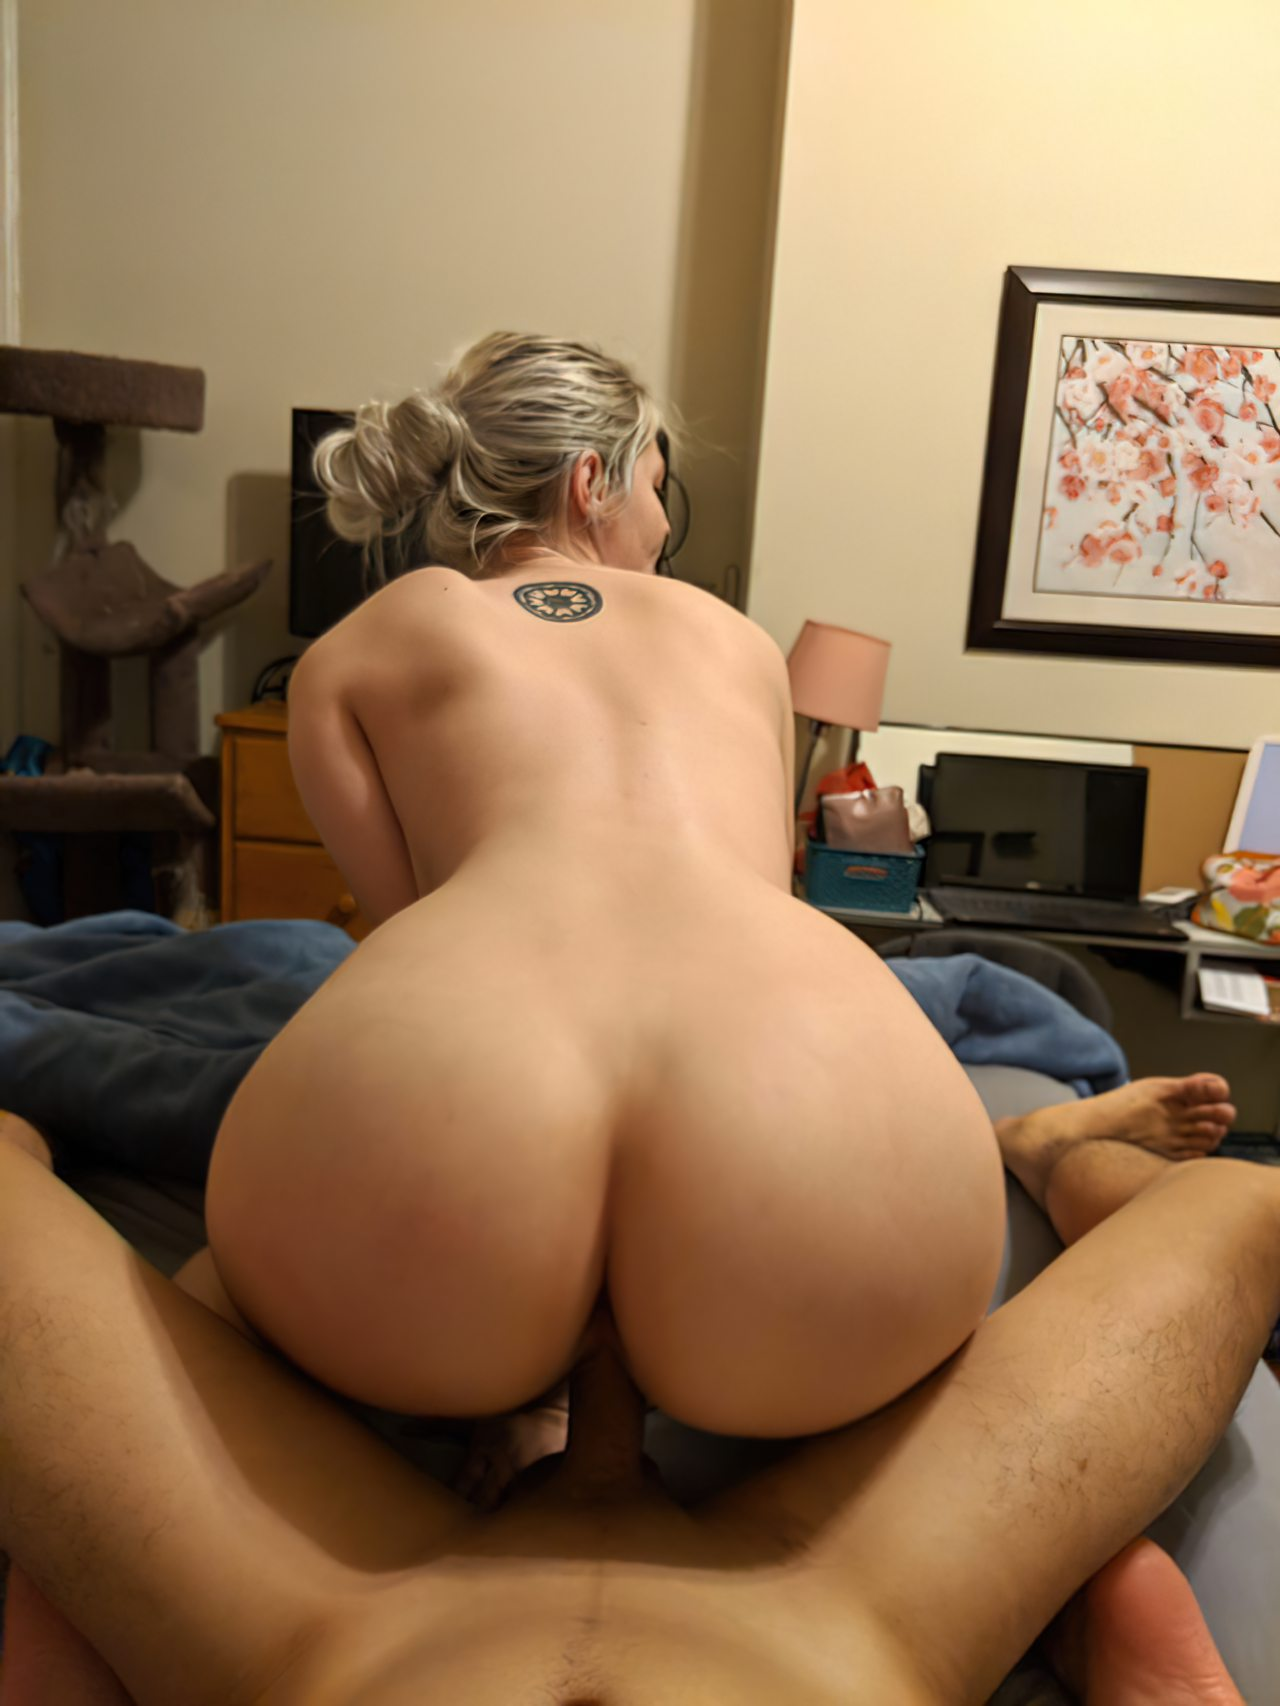 Fotos Sexo Nudes Loira Anonima (1)